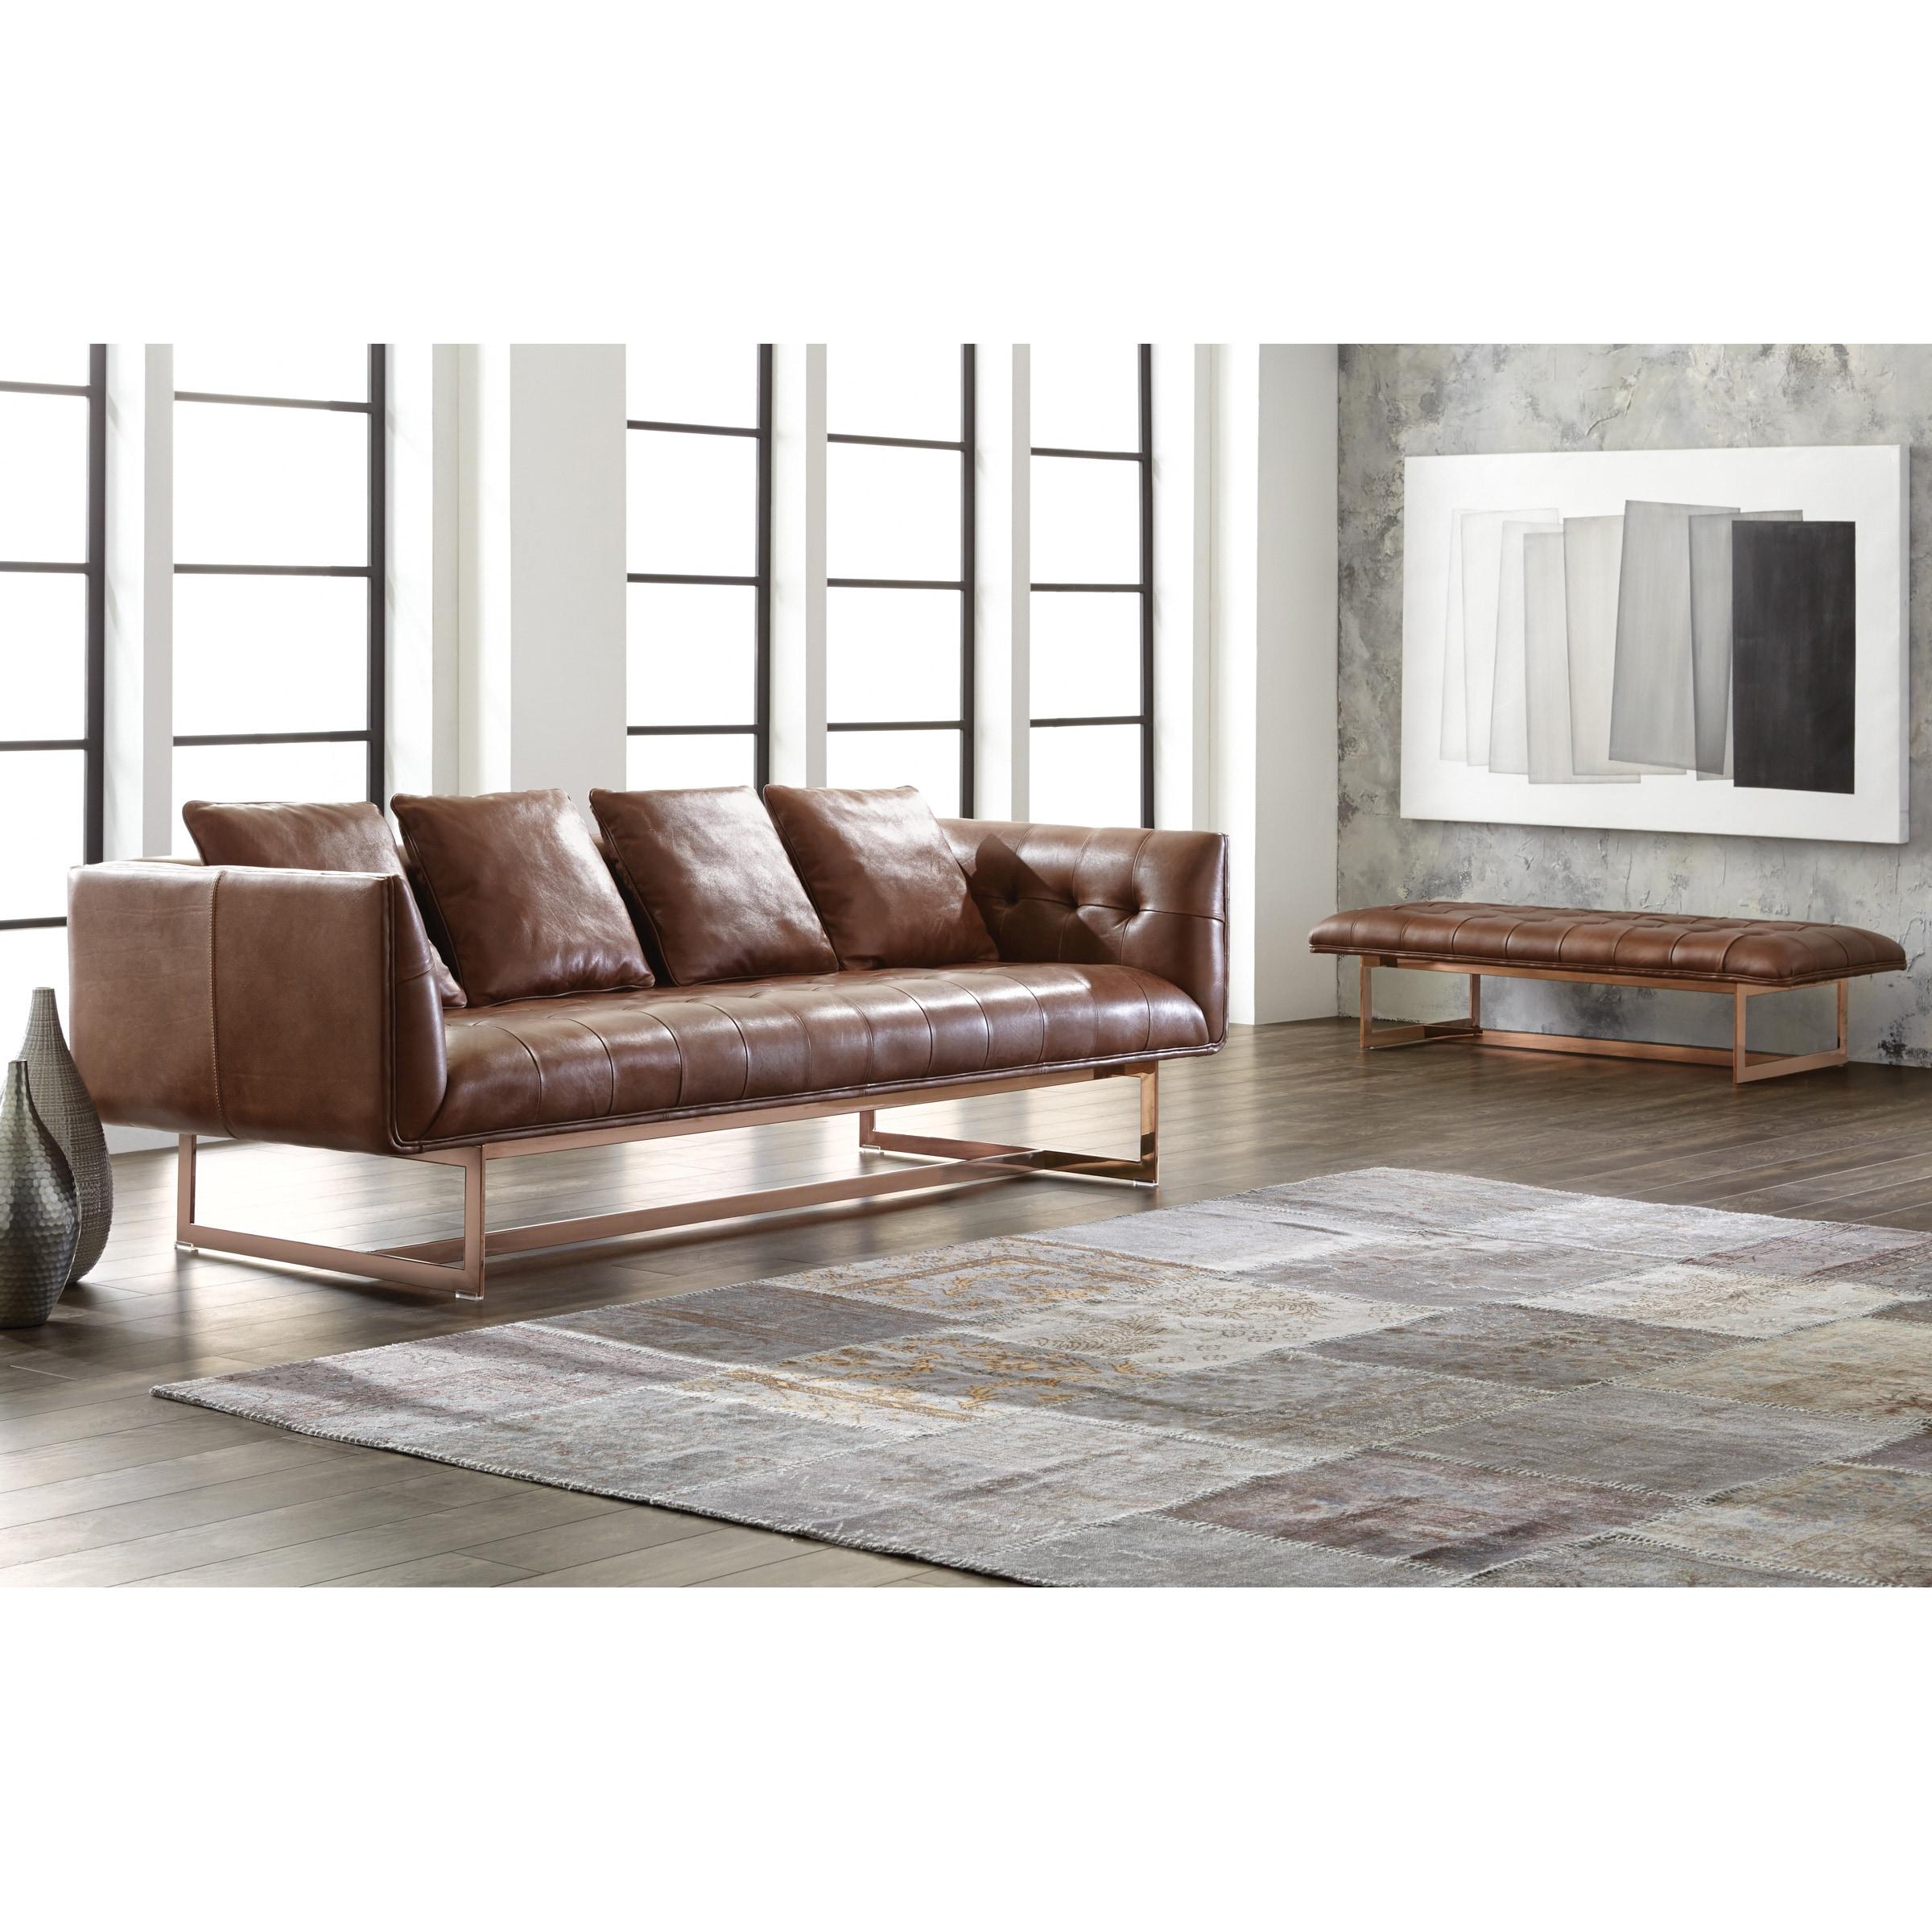 Rose Gold Leather Sofa